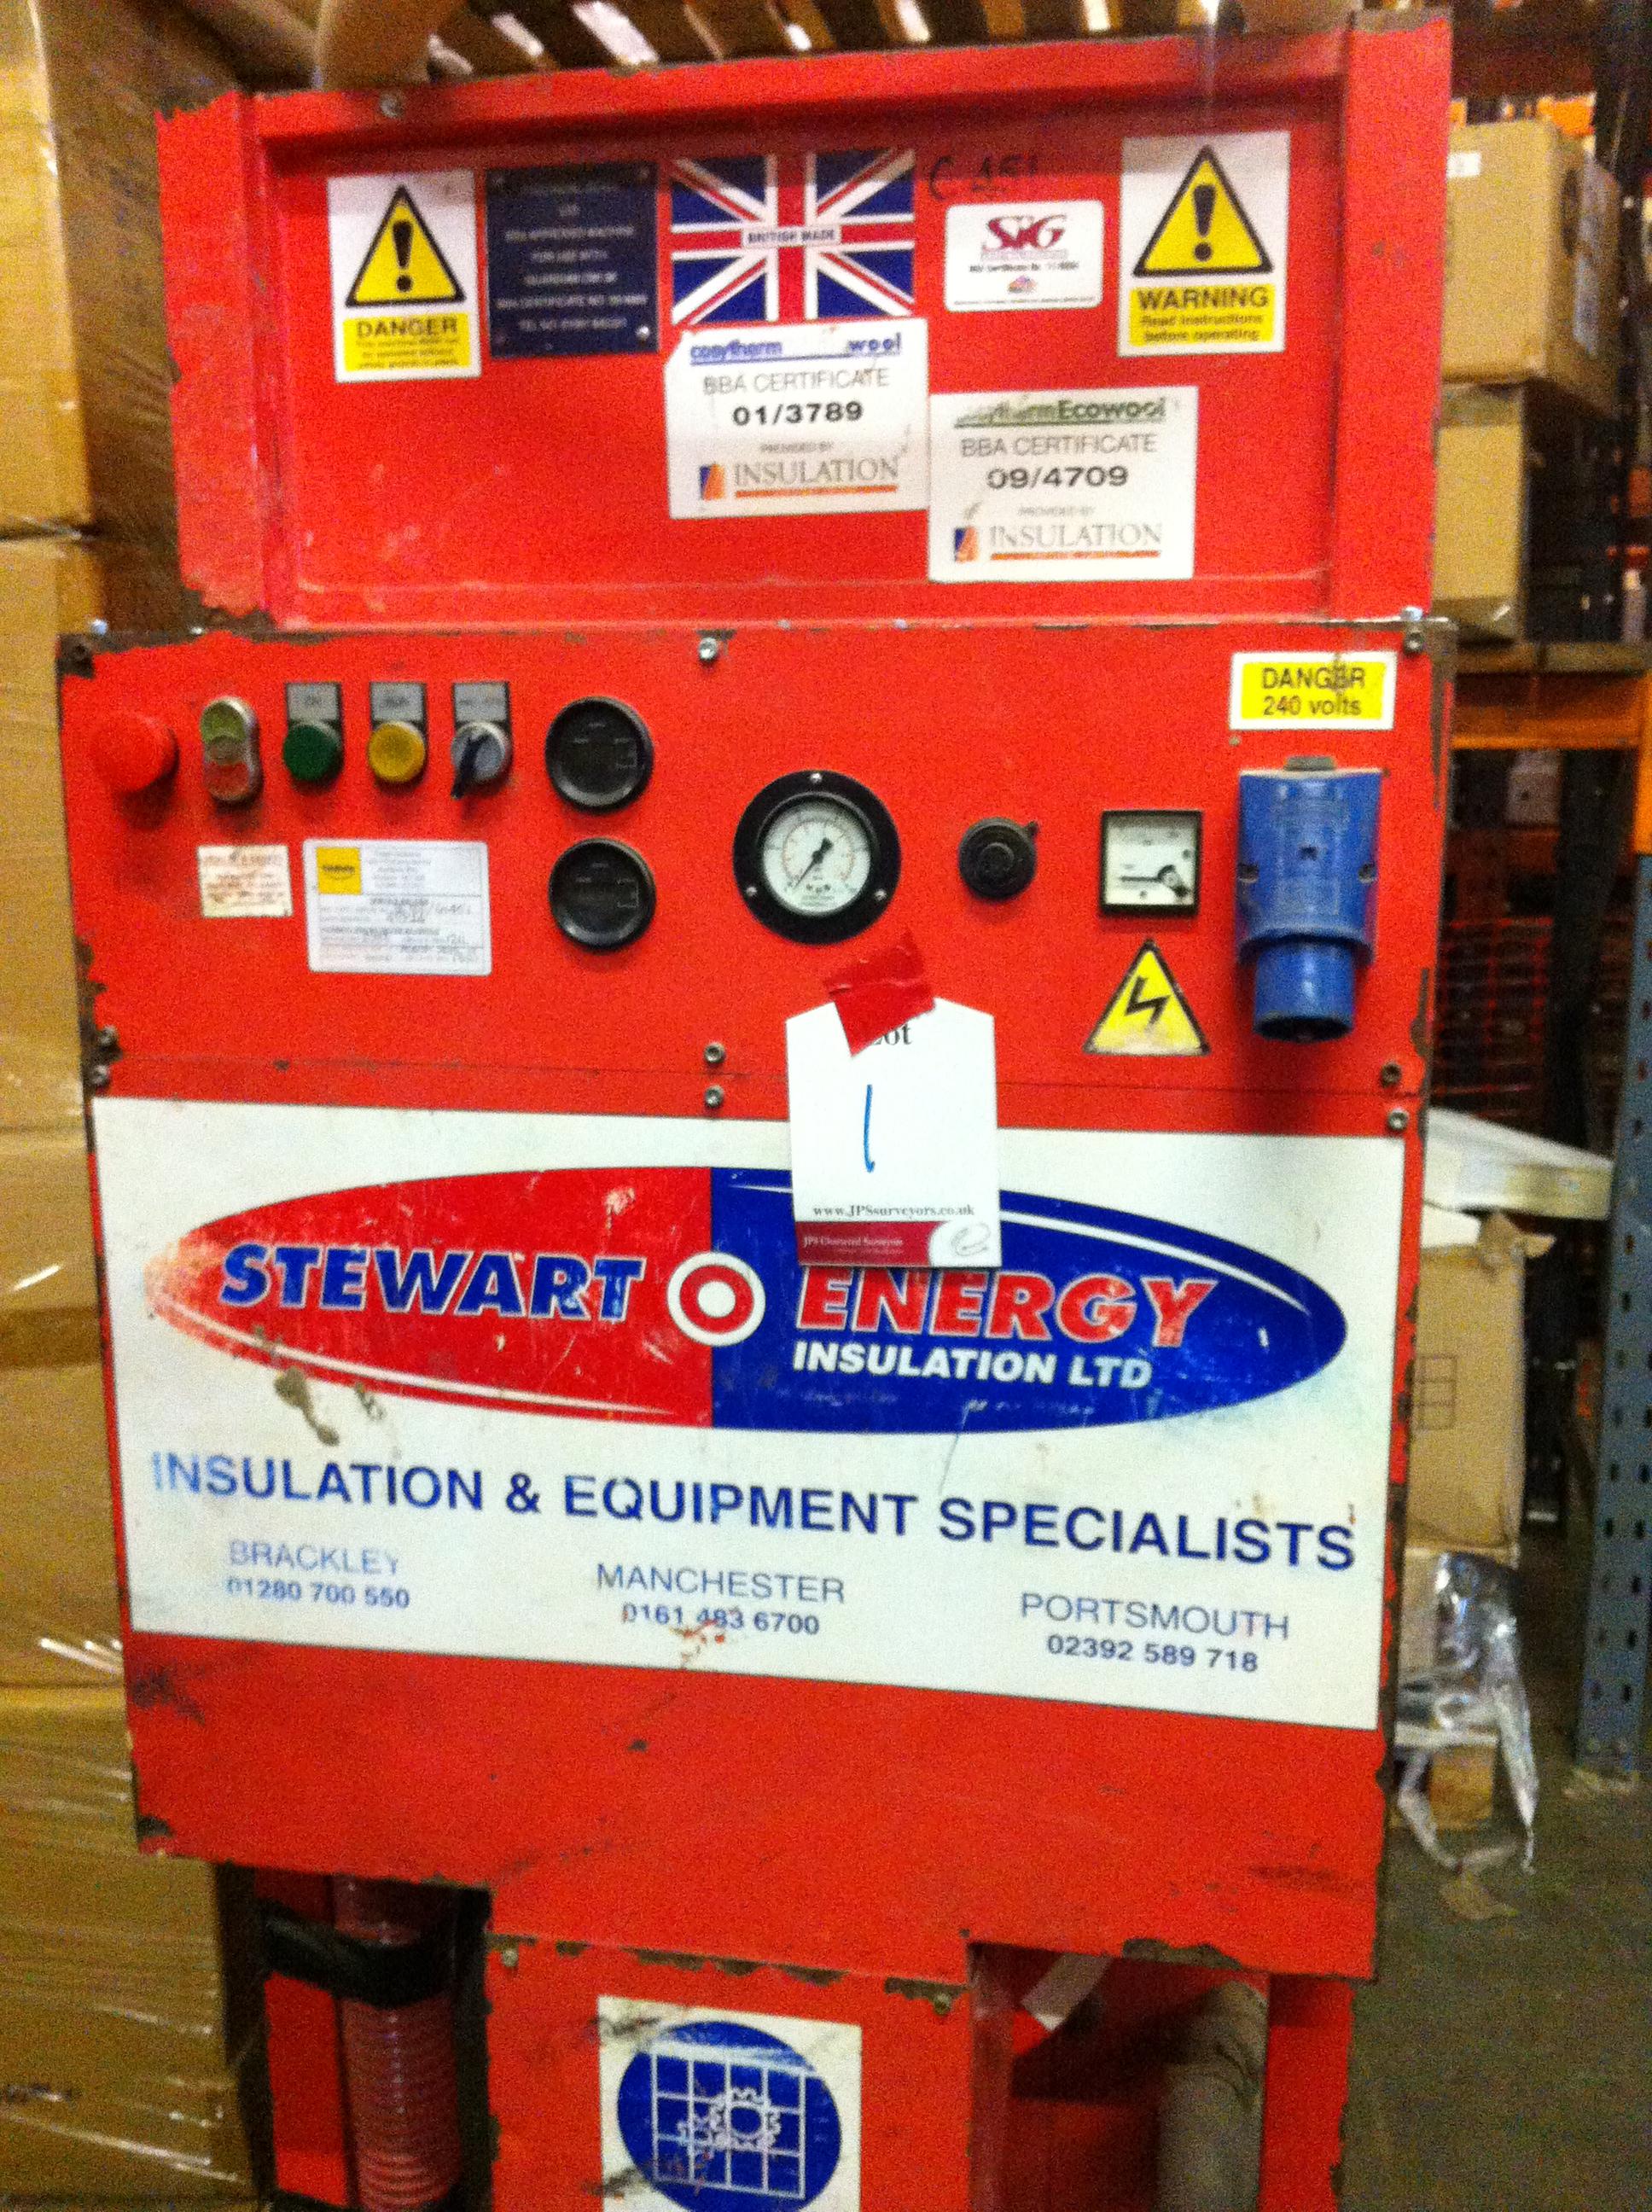 Stuart Energy Cavity Wall Insulation Machine SE500/CH451